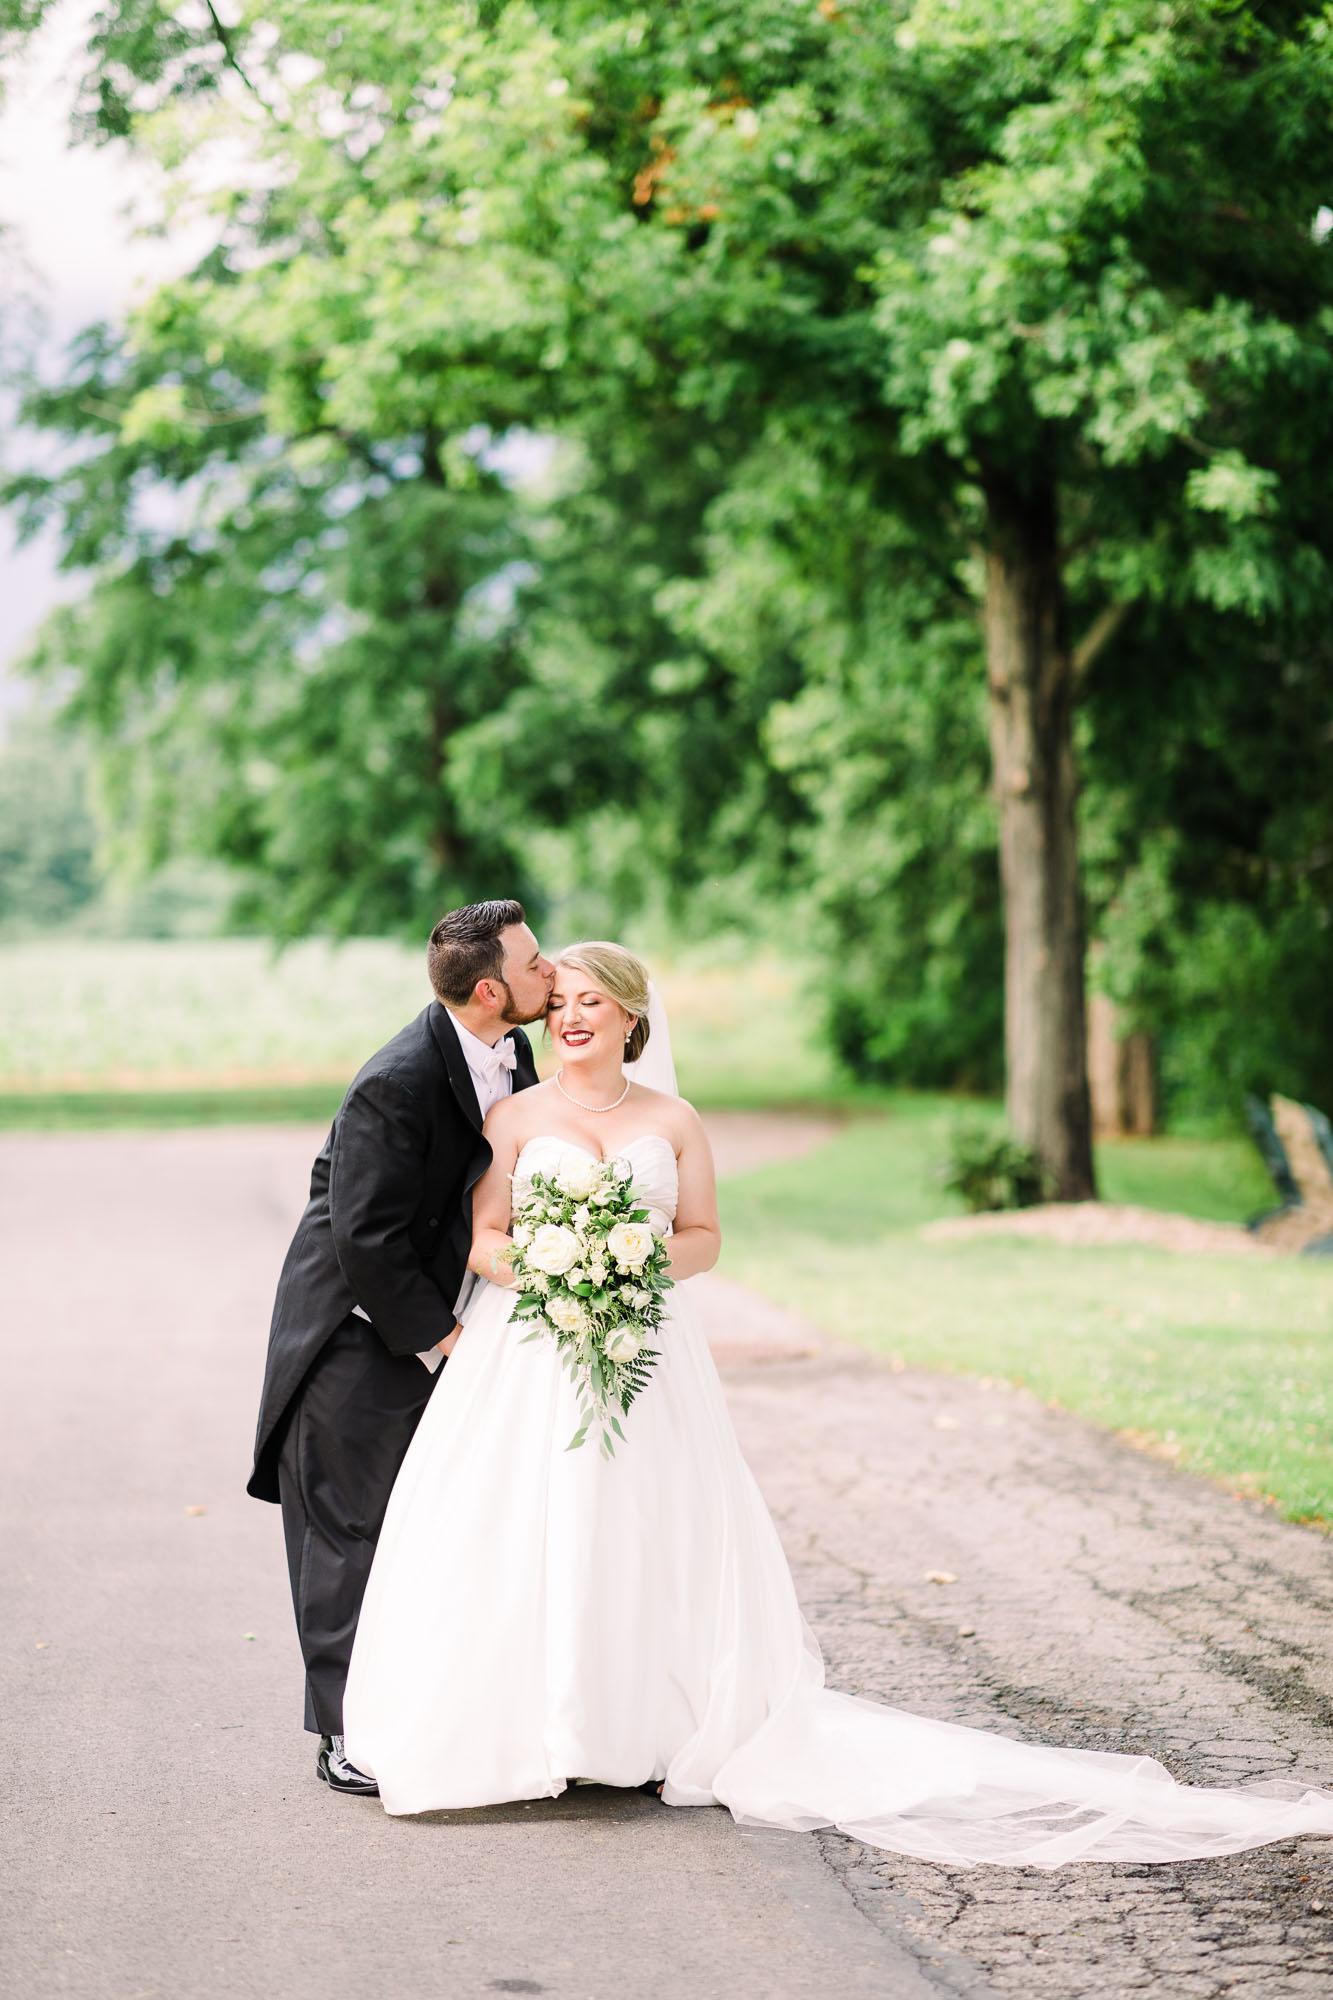 isle-of-que-wedding-4117.jpg